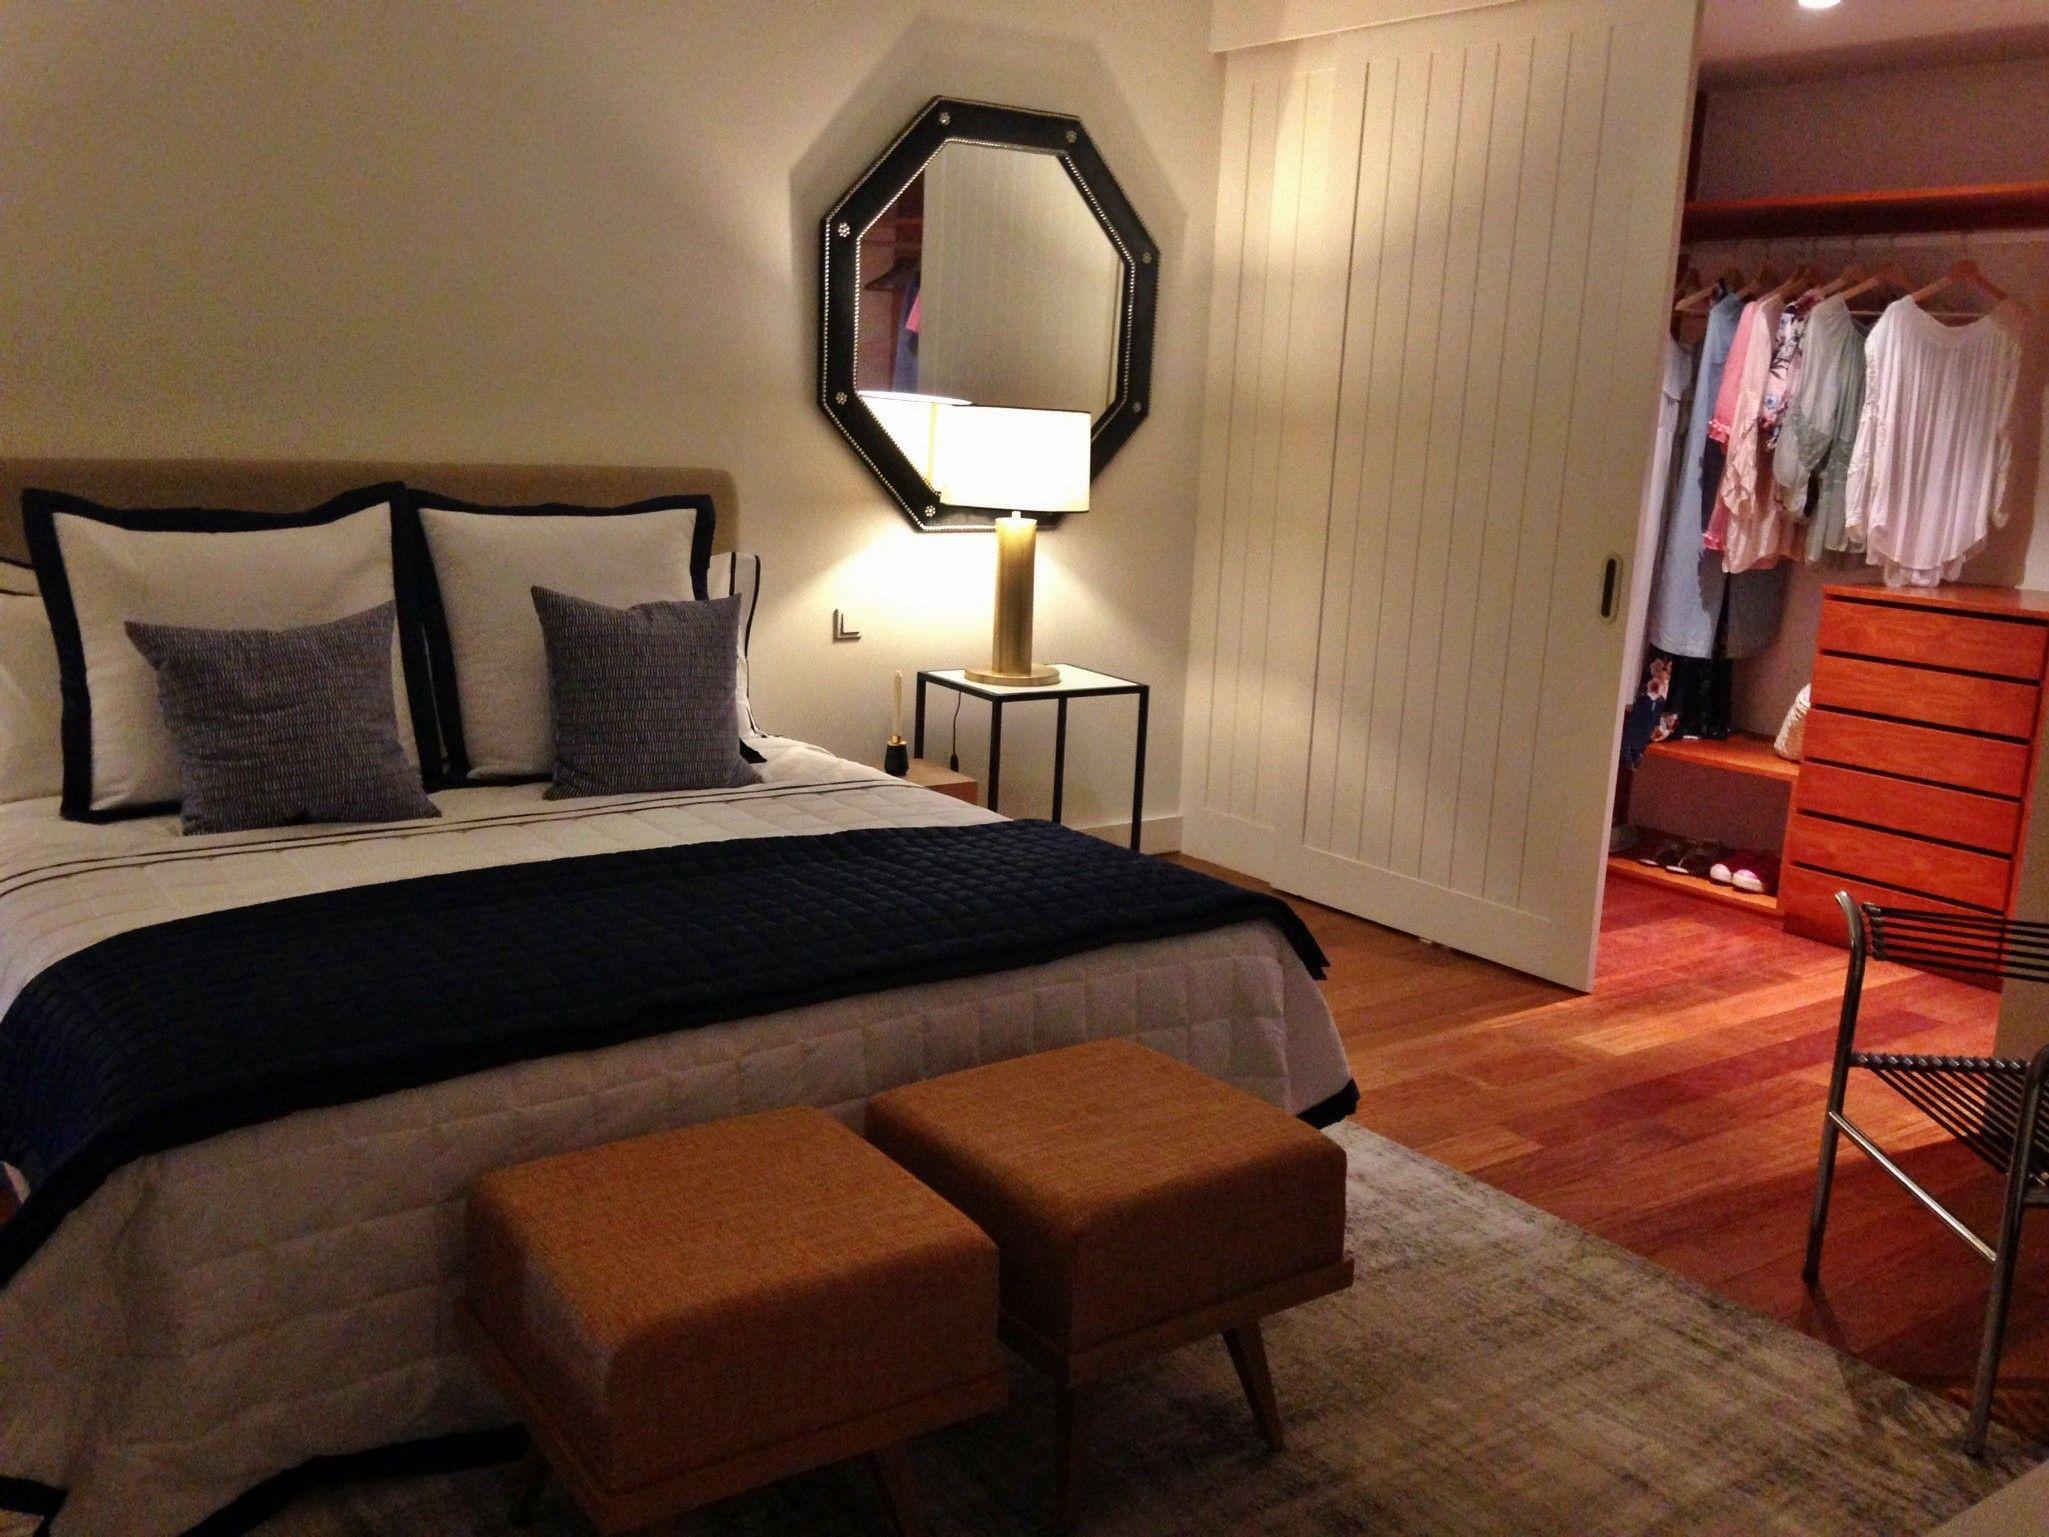 Troia Resort, una experiencia inolvidable